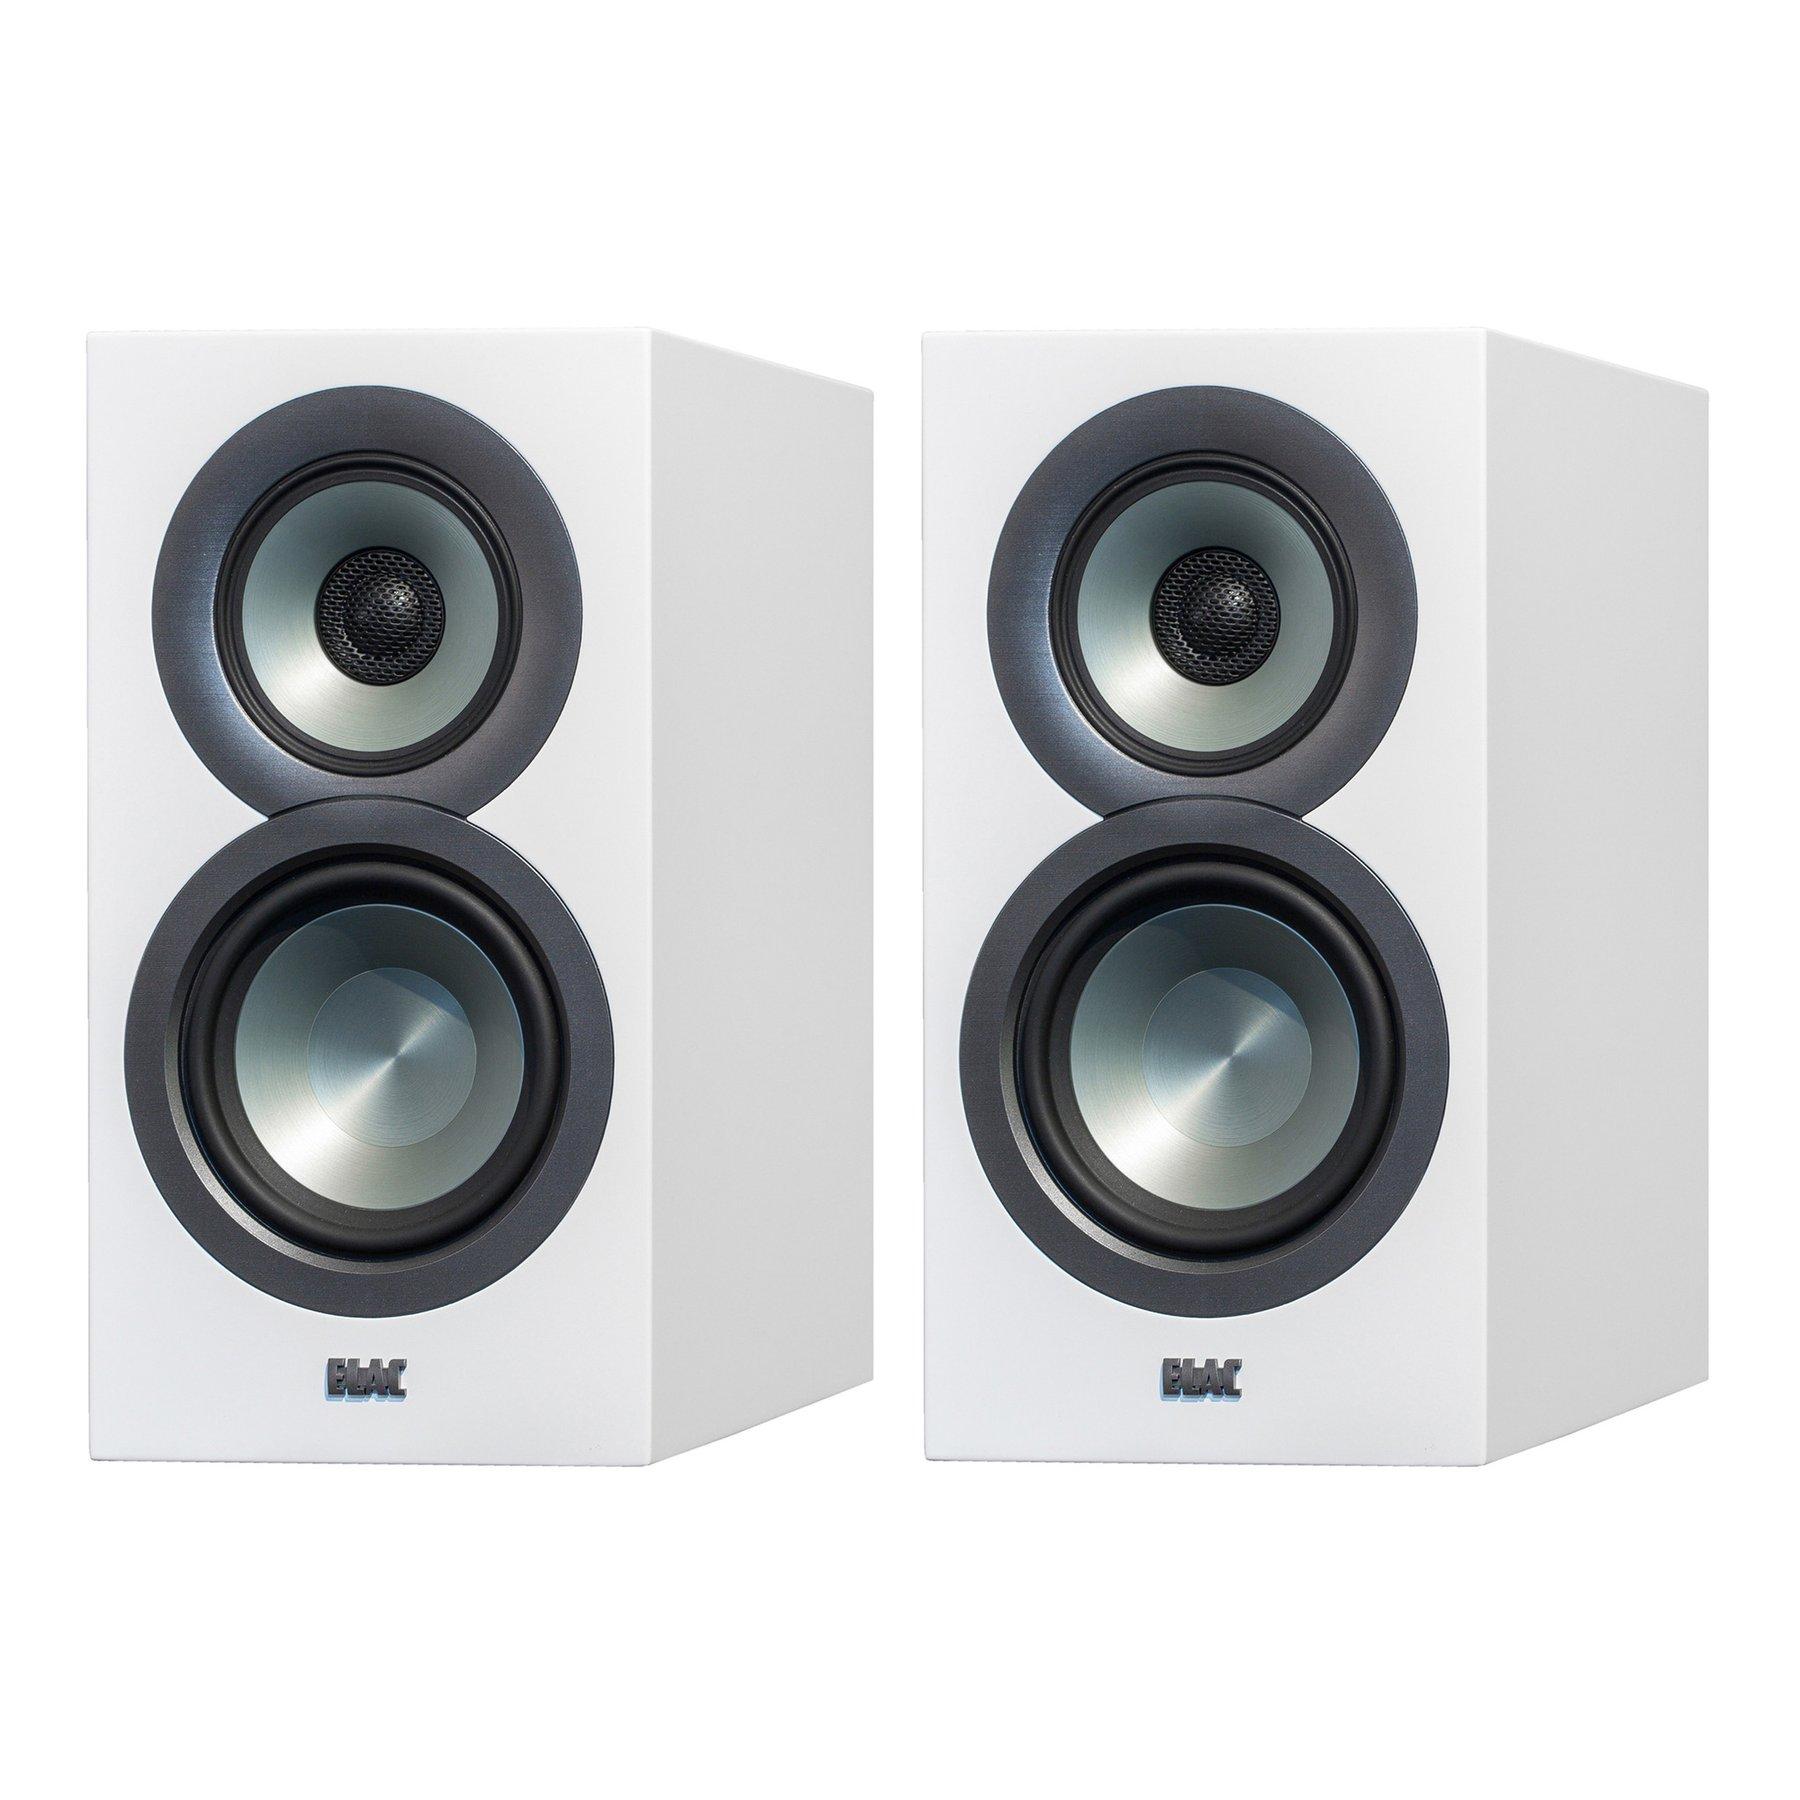 ELAC Uni-fi UB5 Slim Bookshelf 3-Way Speaker Pair White or Black by Andrew Jones $537.42